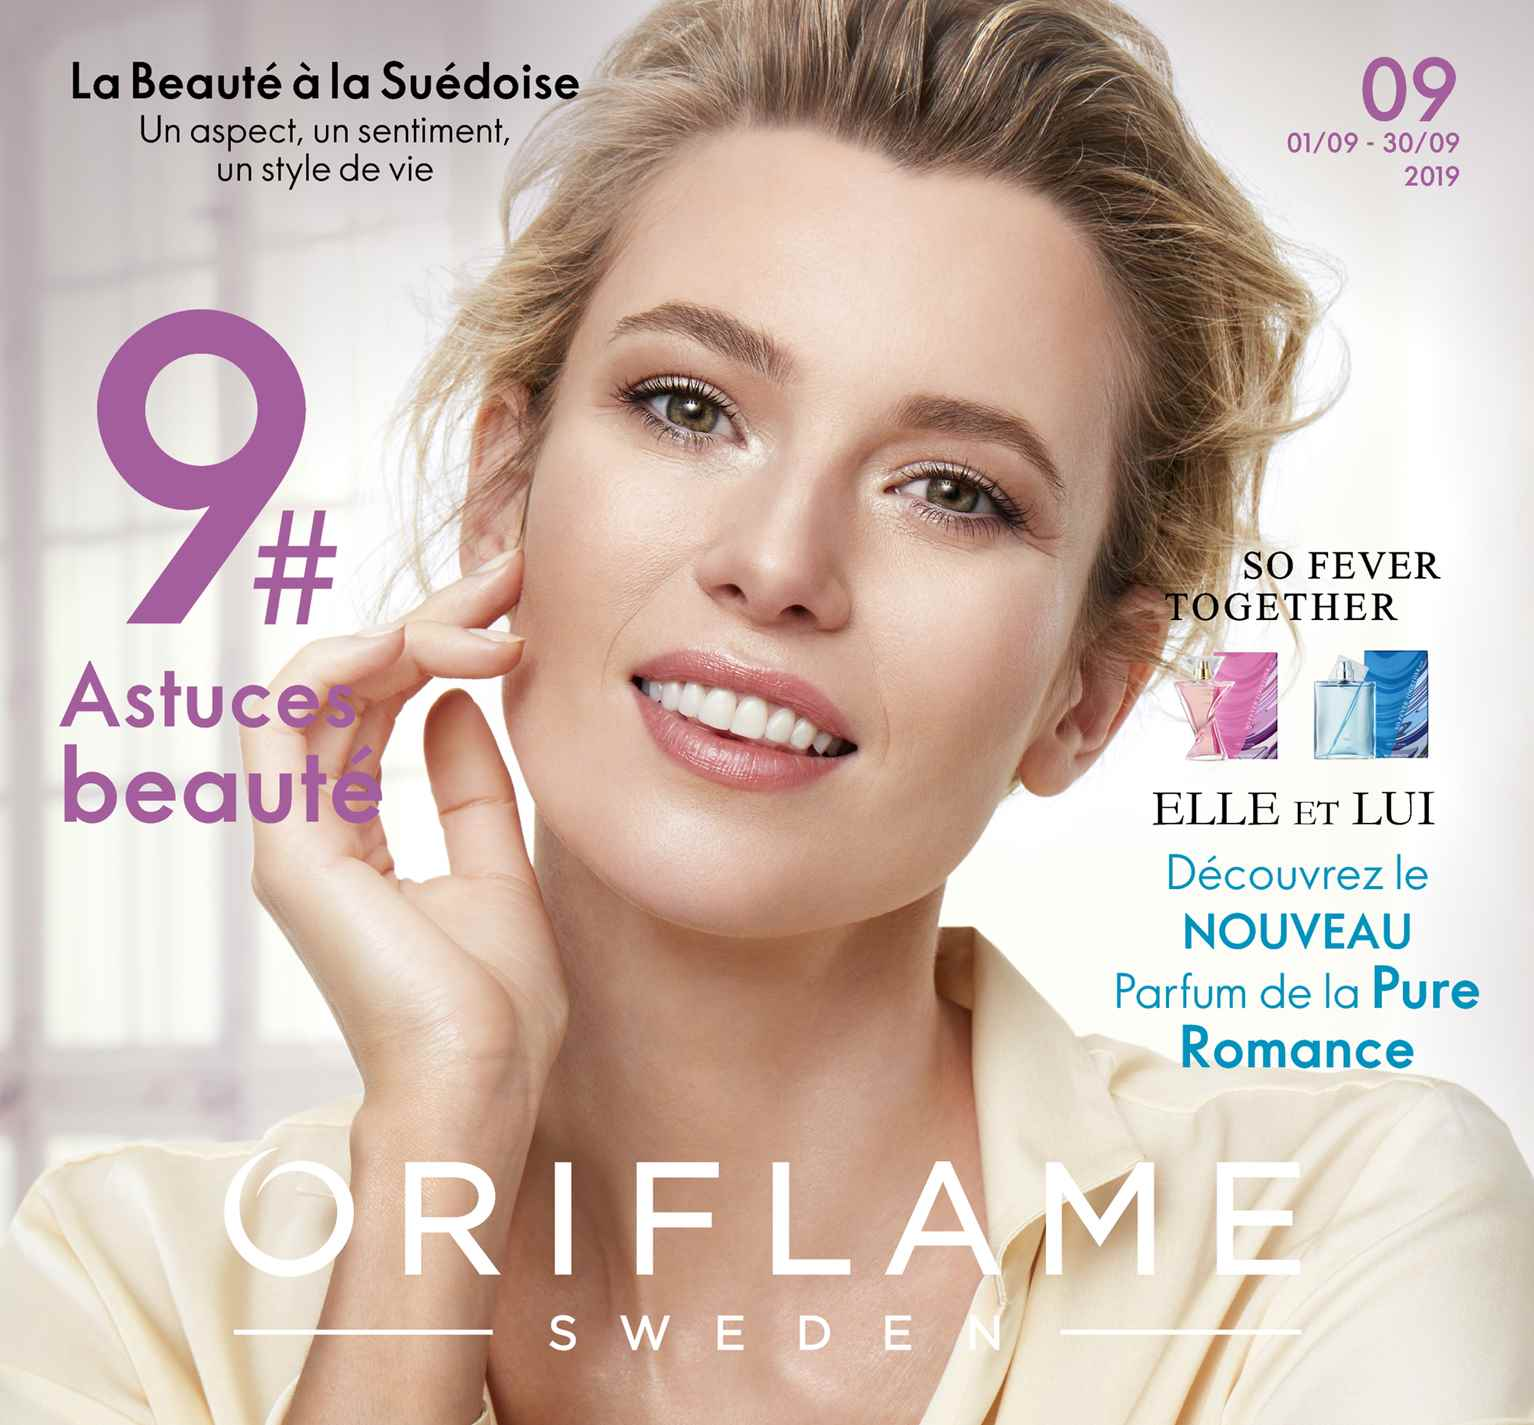 Catalogue Oriflame Maroc Septembre 2019